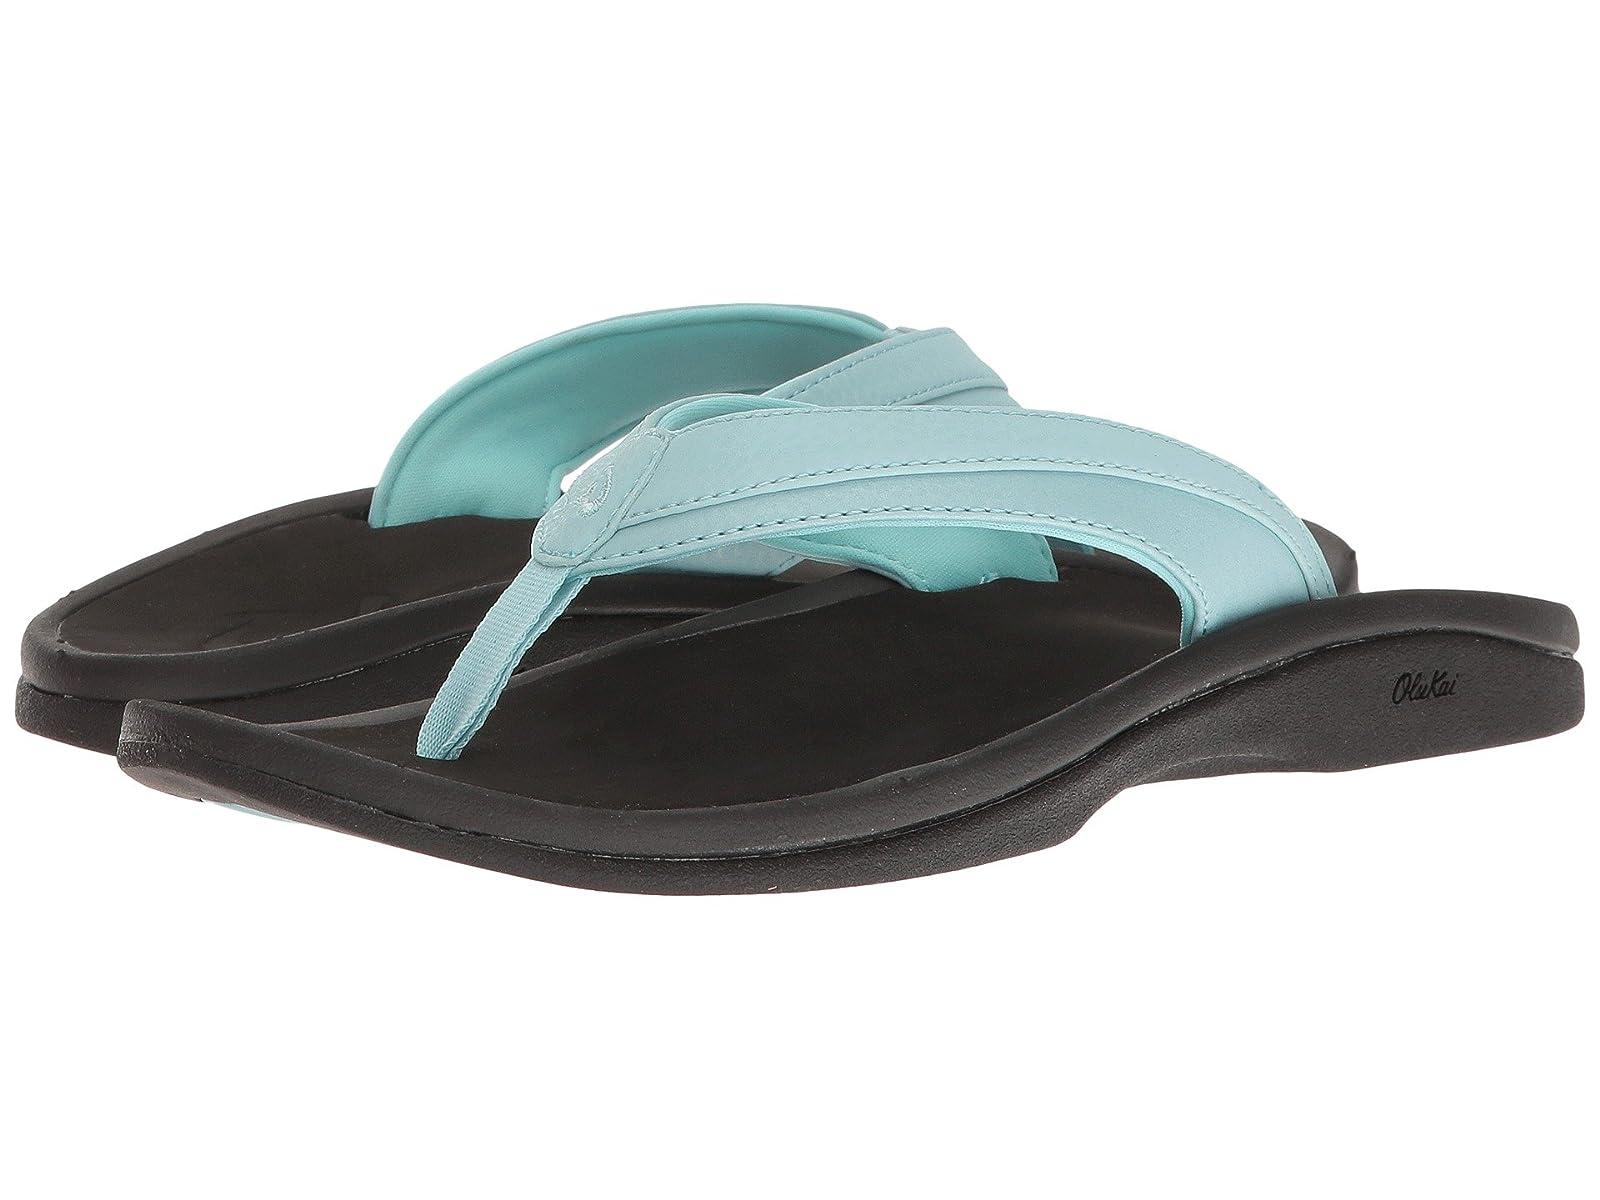 OluKai Ohana WAtmospheric grades have affordable shoes